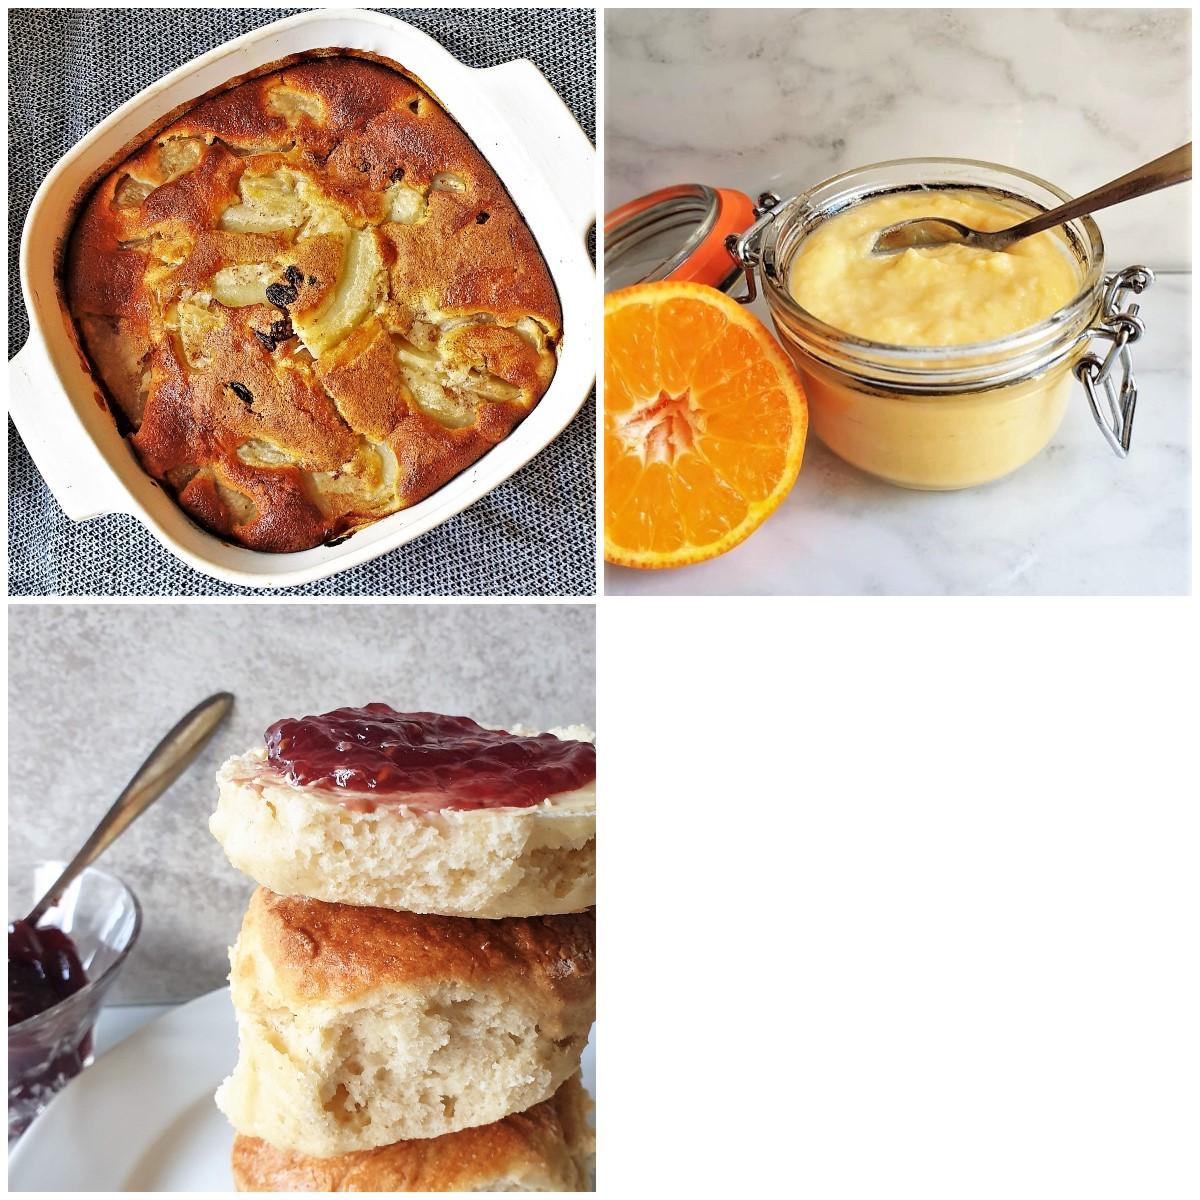 An easy apple cake, homemade orange curd, and a plate of 3-ingredient lemonade scones.